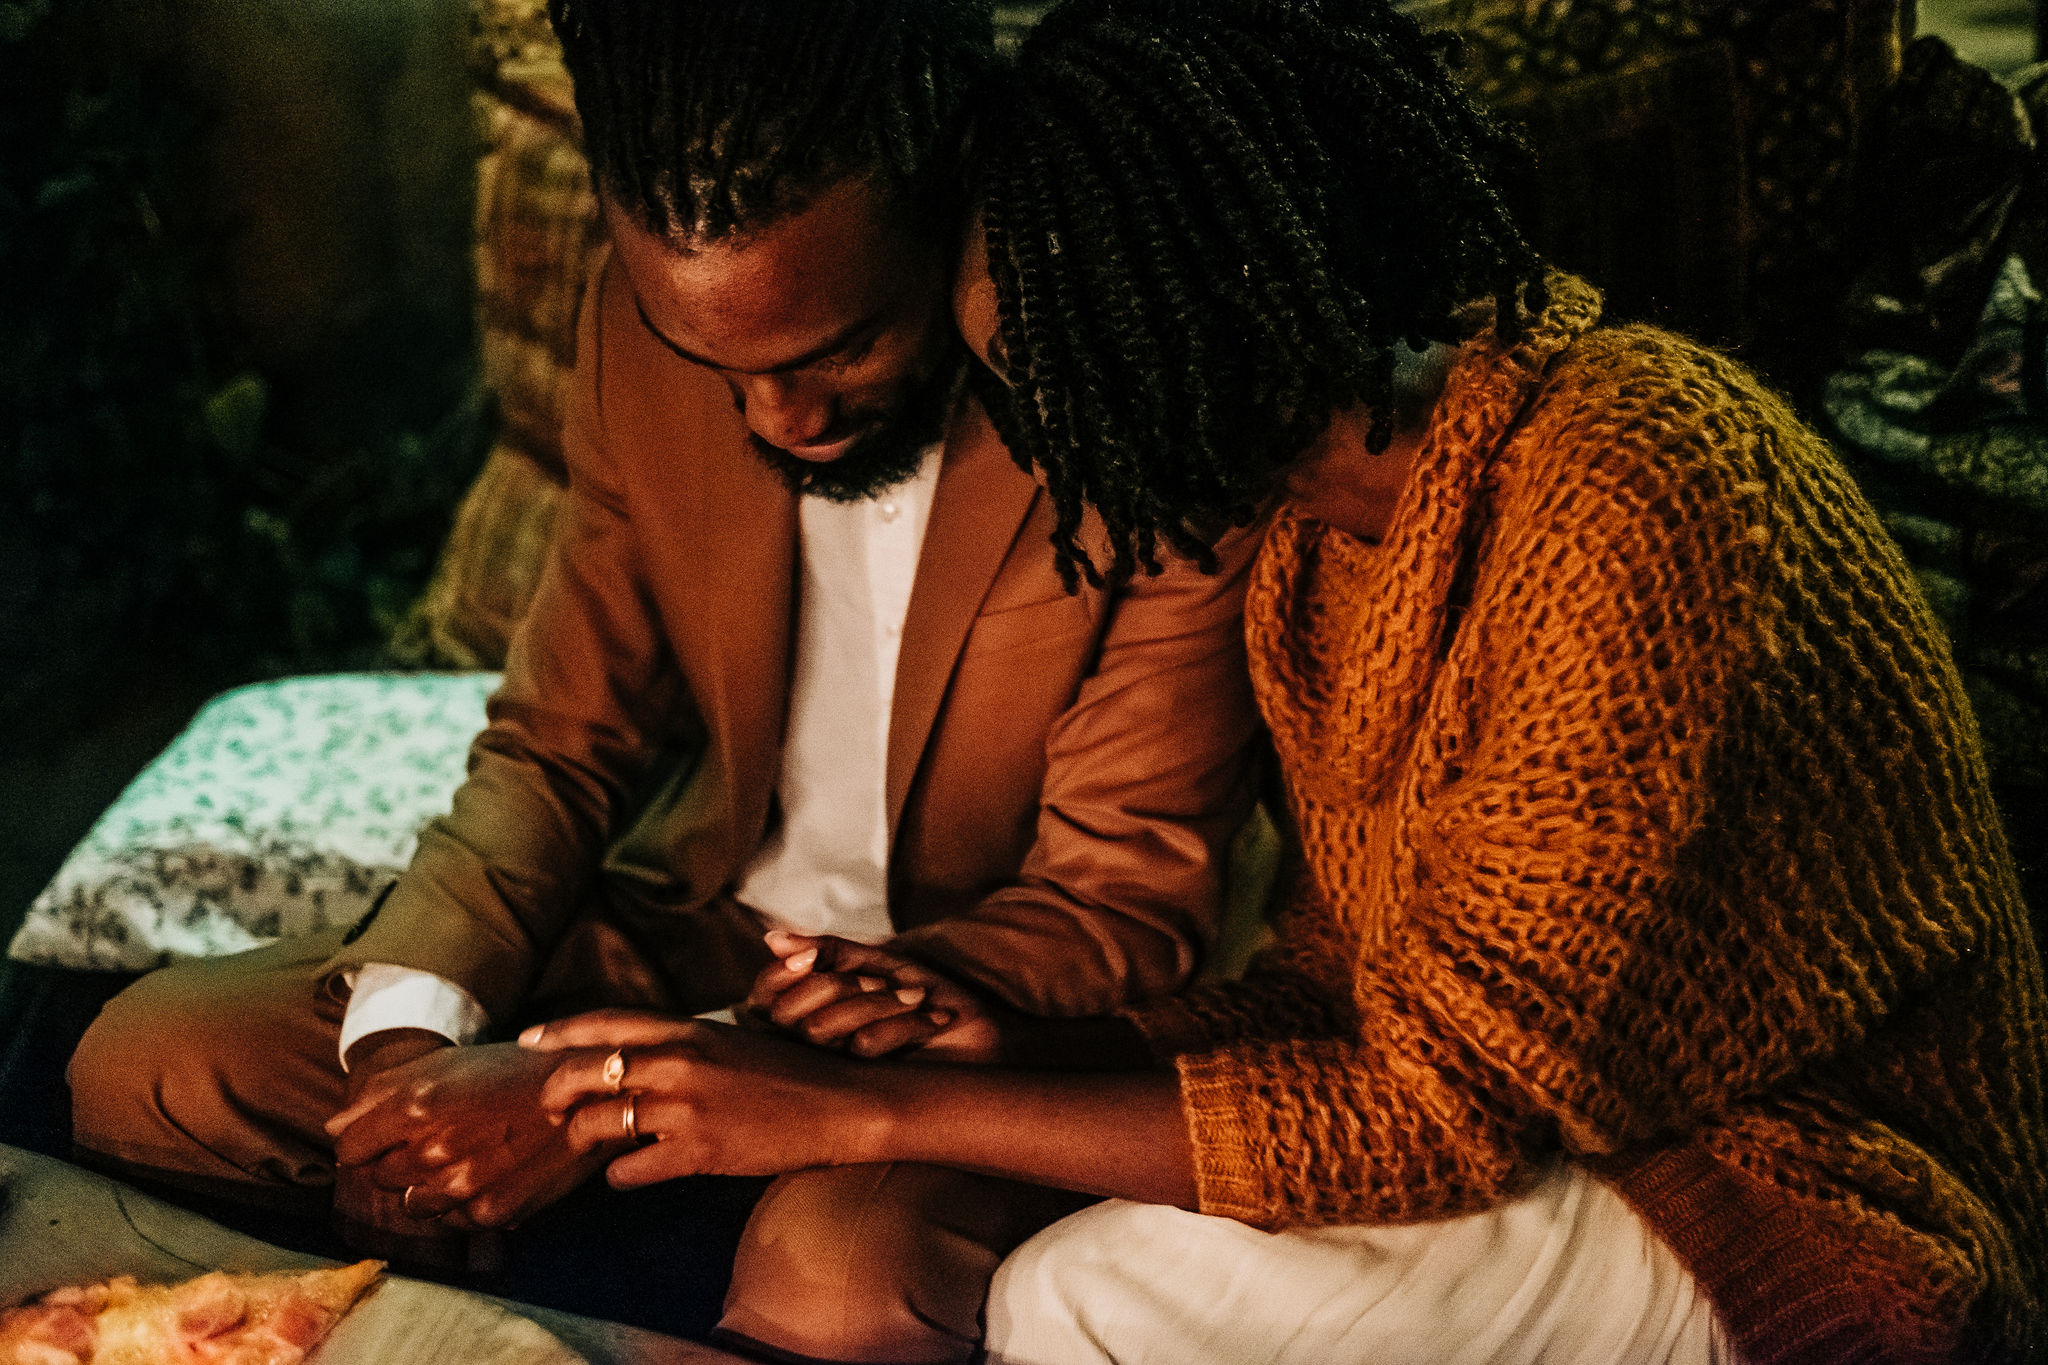 Anna-Hari-Photography-Destination-Wedding-Photographer-Kenya-305.jpg